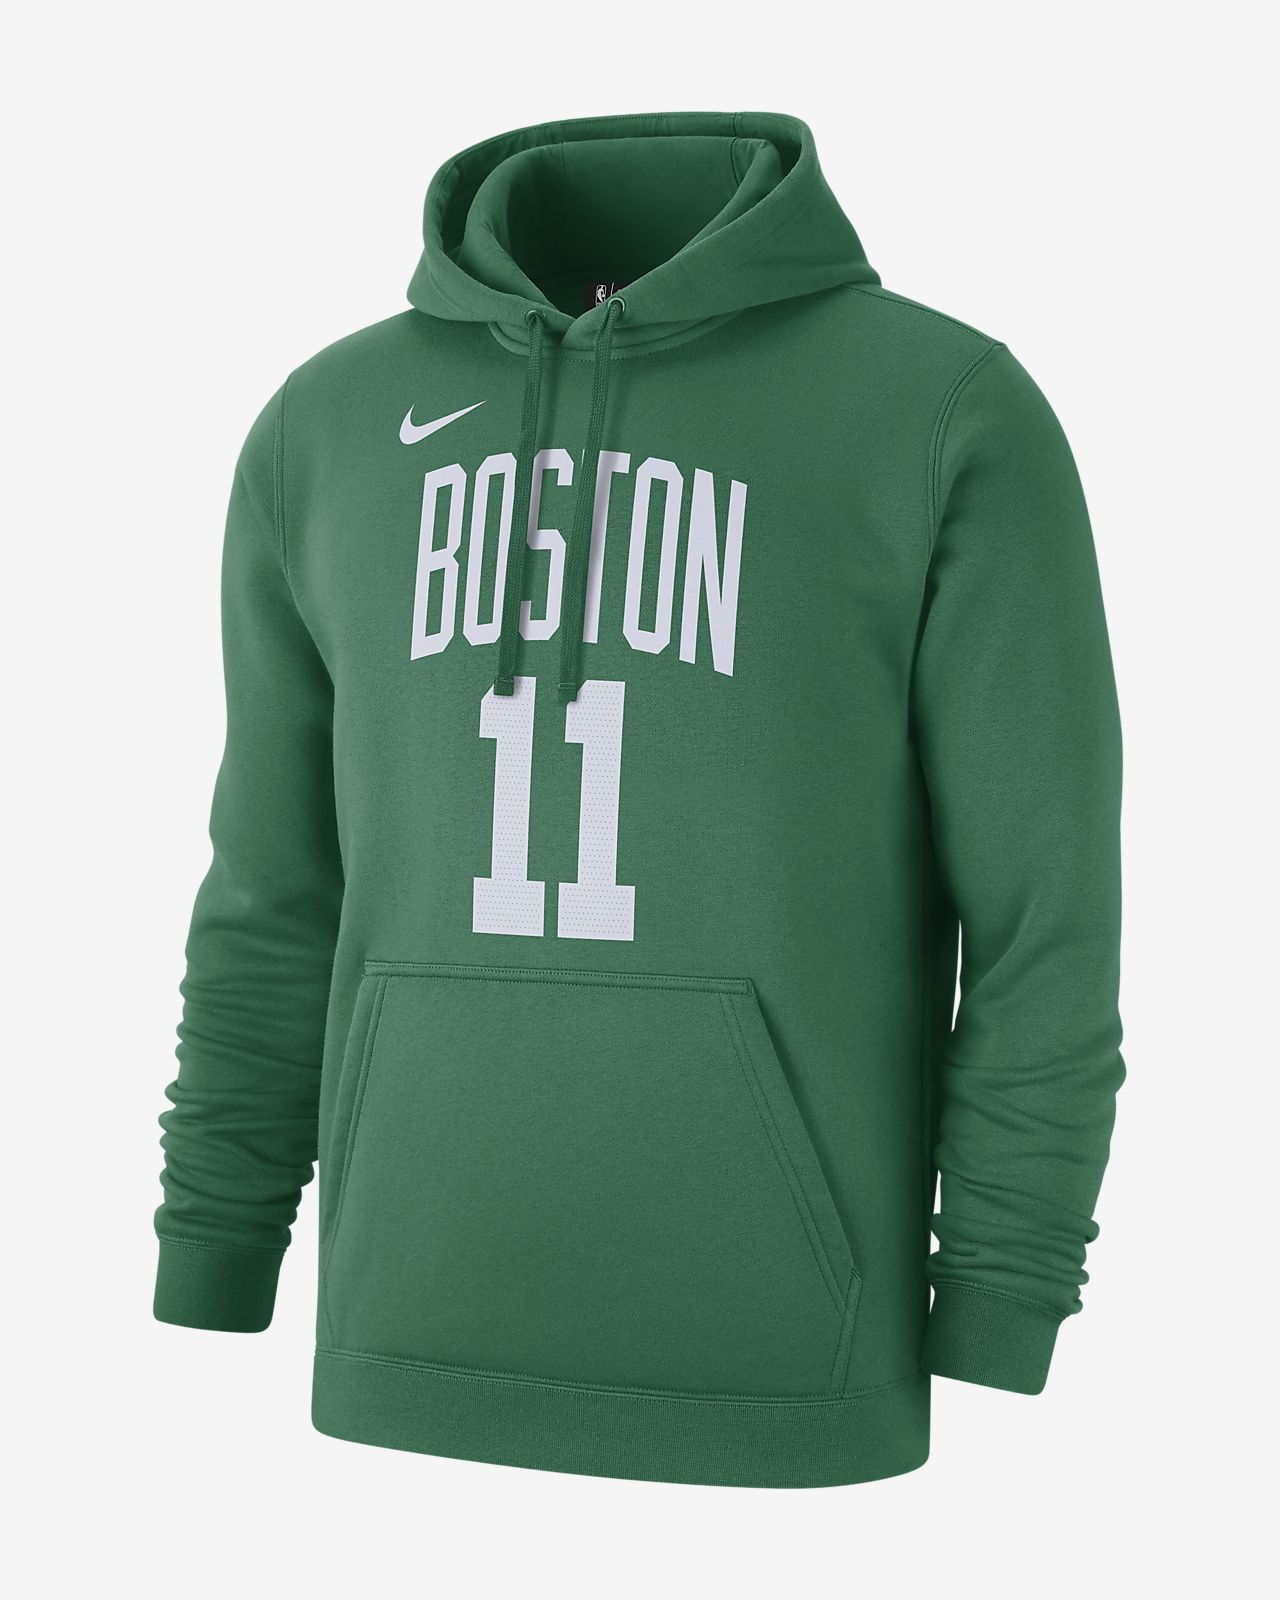 Kyrie Irving Boston Celtics Nike Men's NBA Hoodie